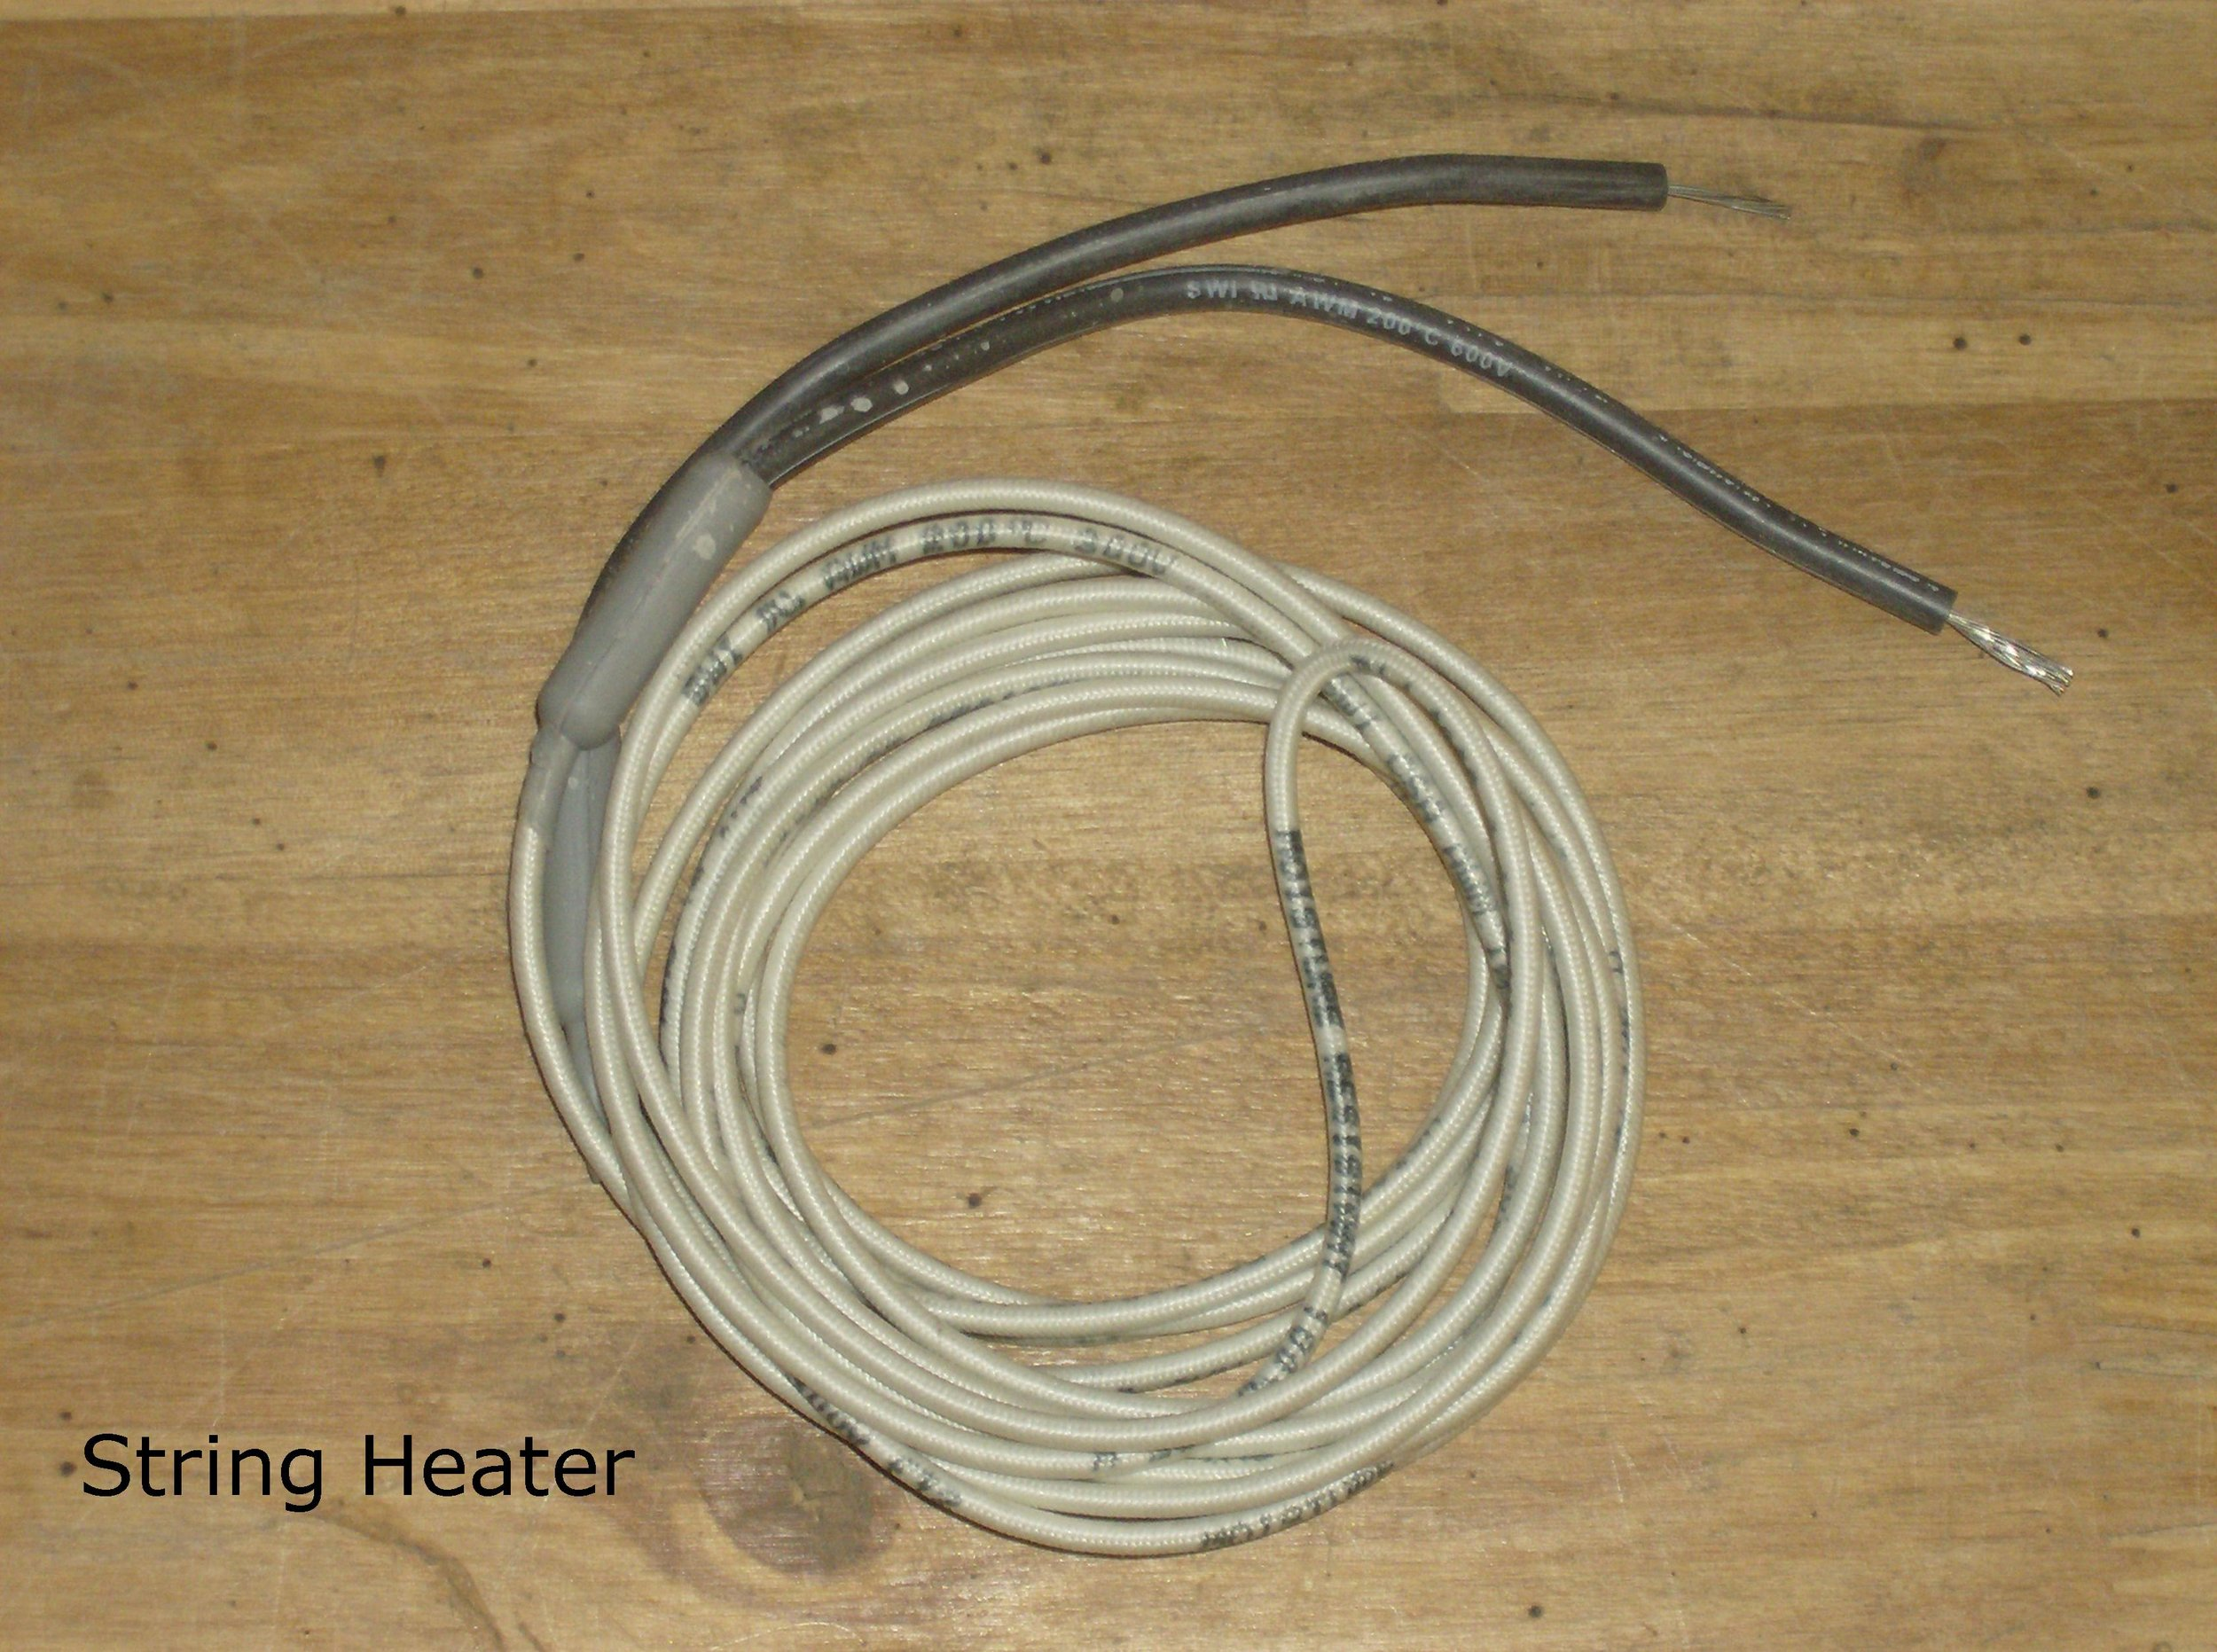 #24405 5 Foot Air Space Heater